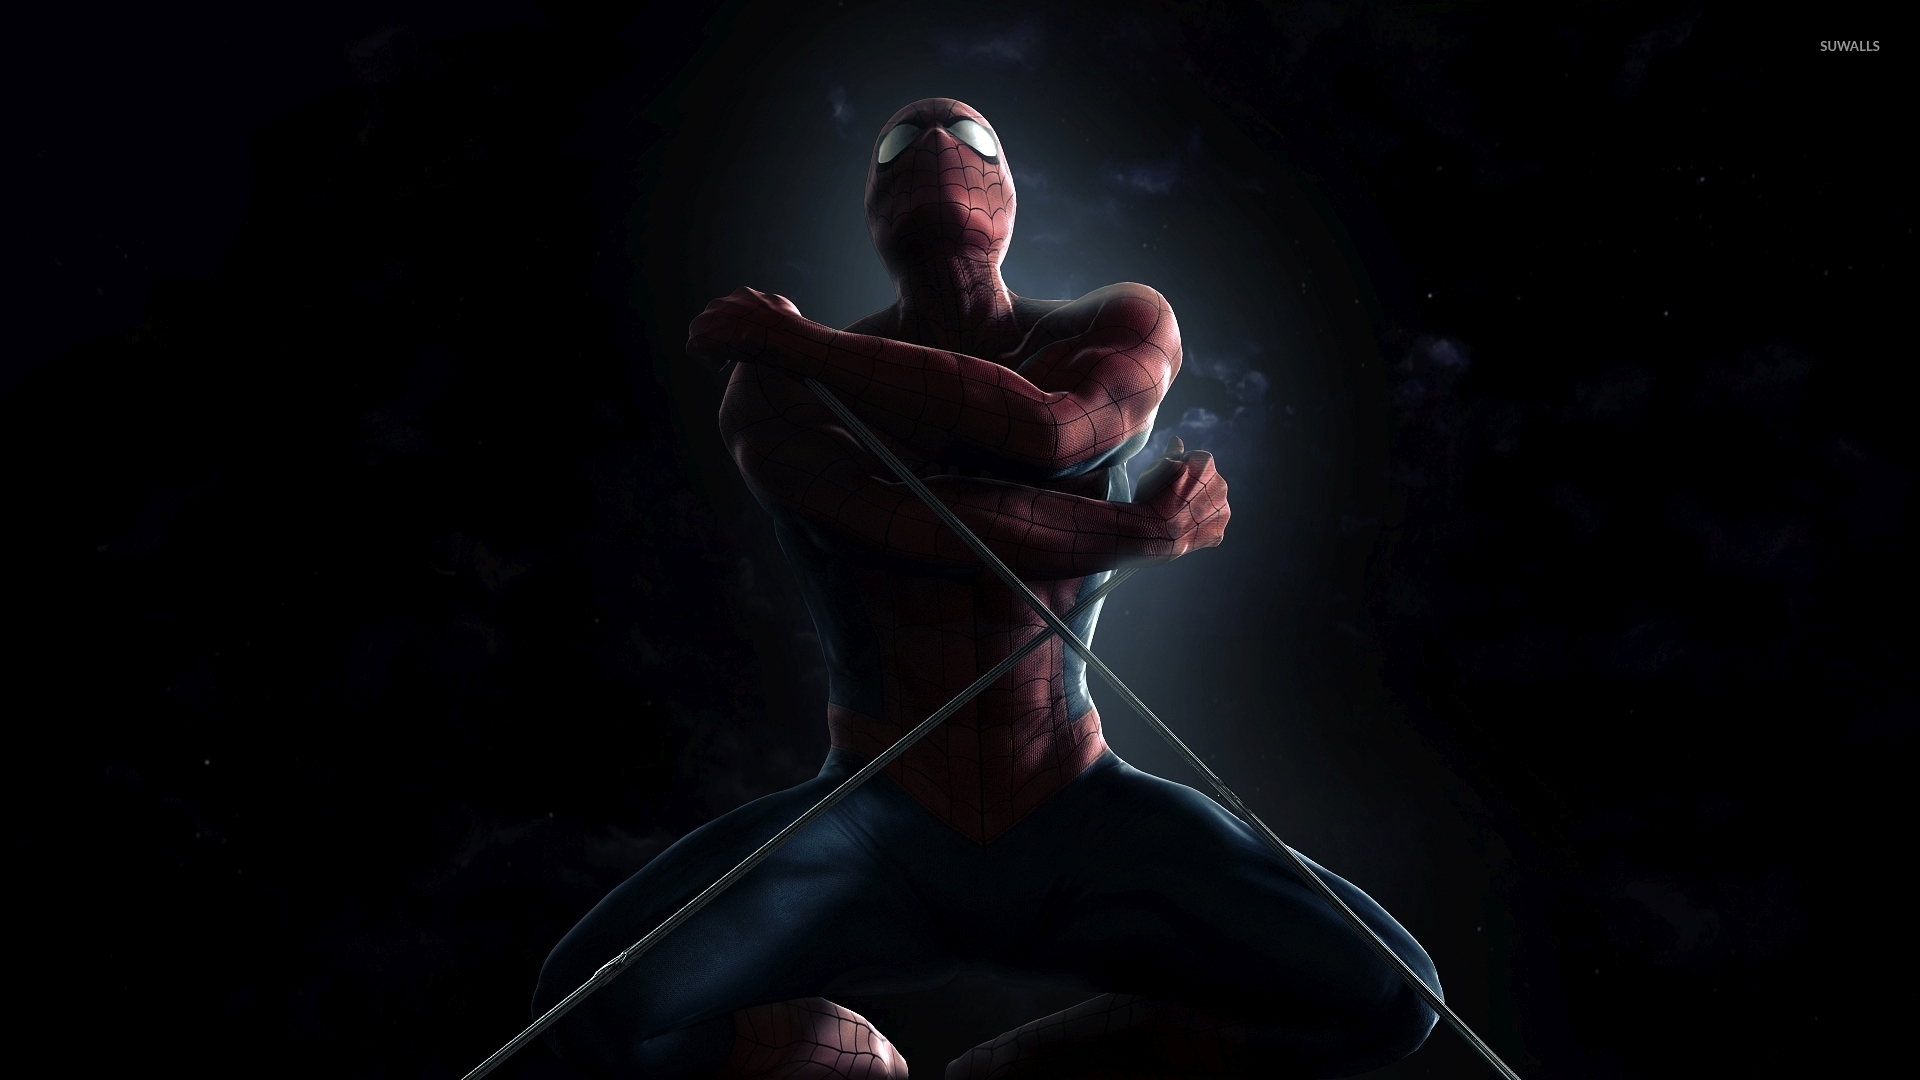 Spider man wallpaper 96473 wallpaper